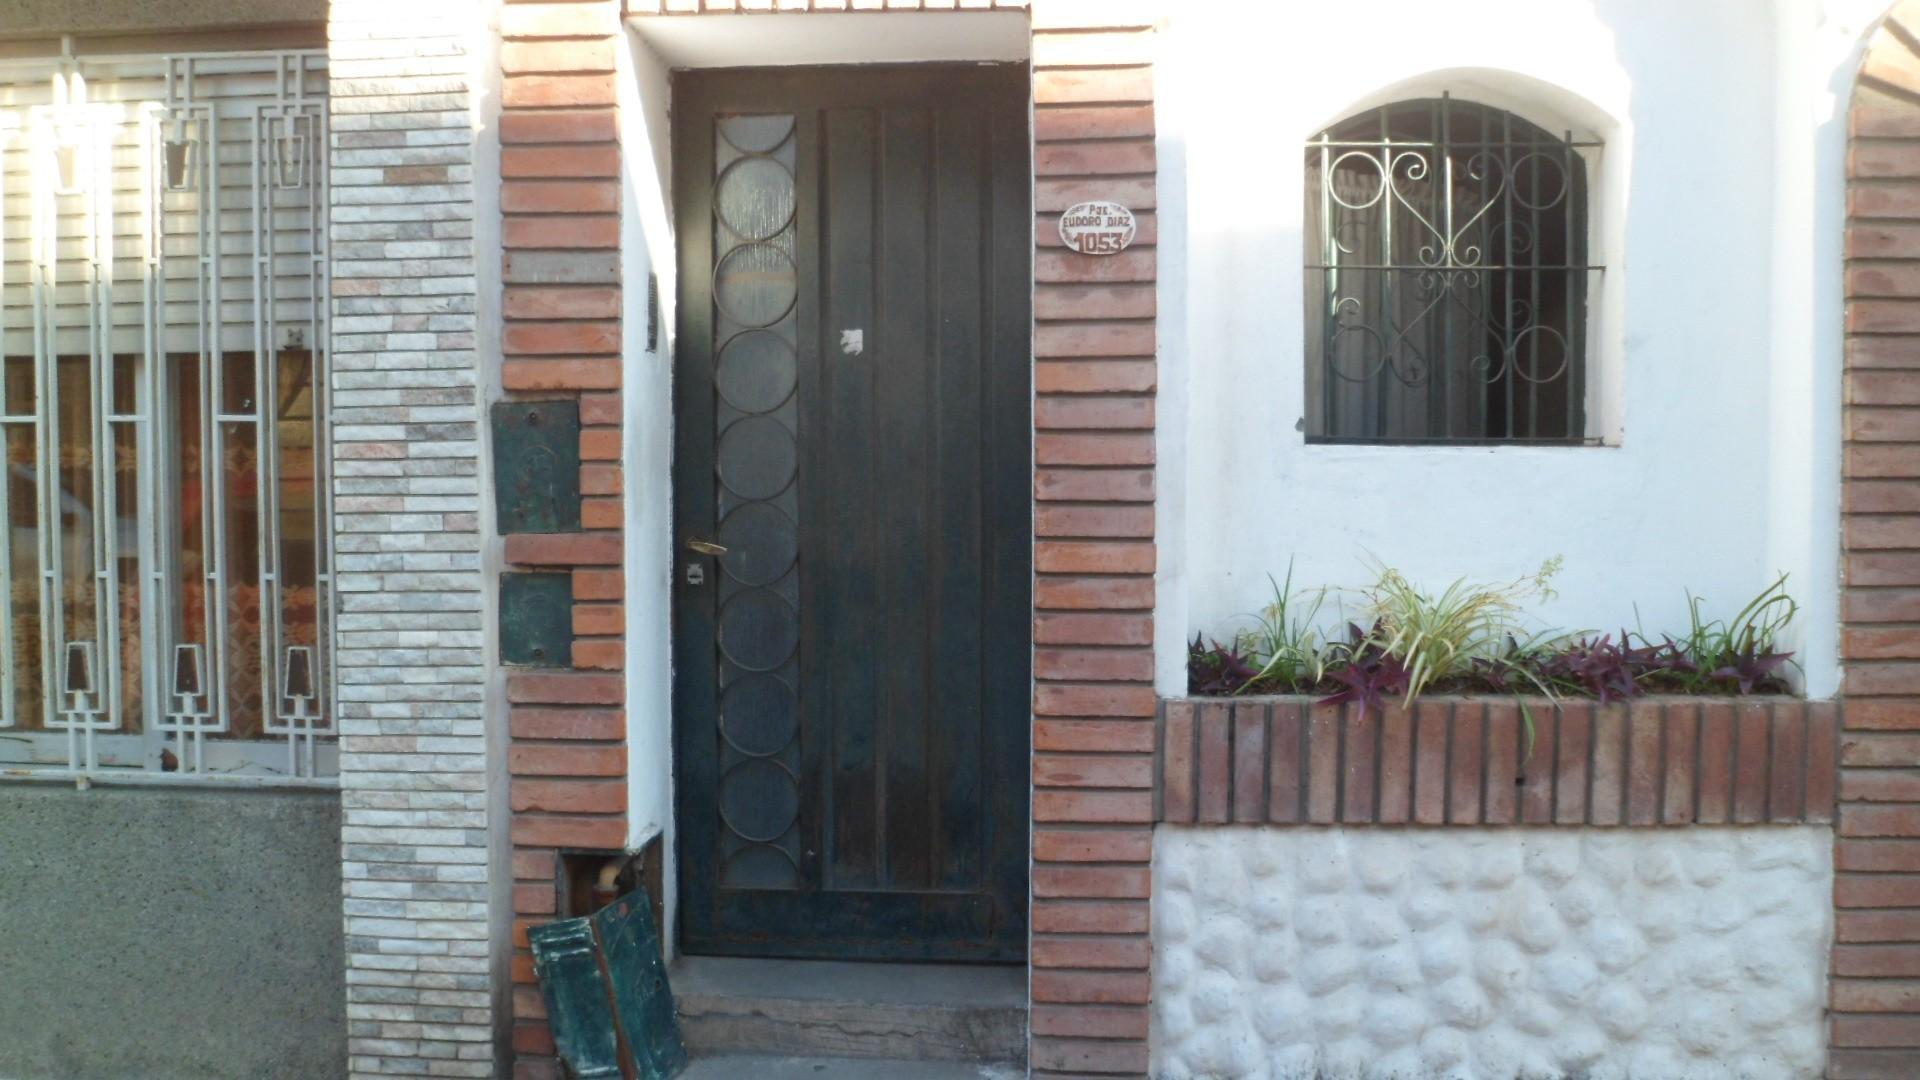 MB Negocios Inmobiliarios VENDE. CASA INTERNA UNICA. DOS DORMITORIOS. EXCELENTE ZONA.